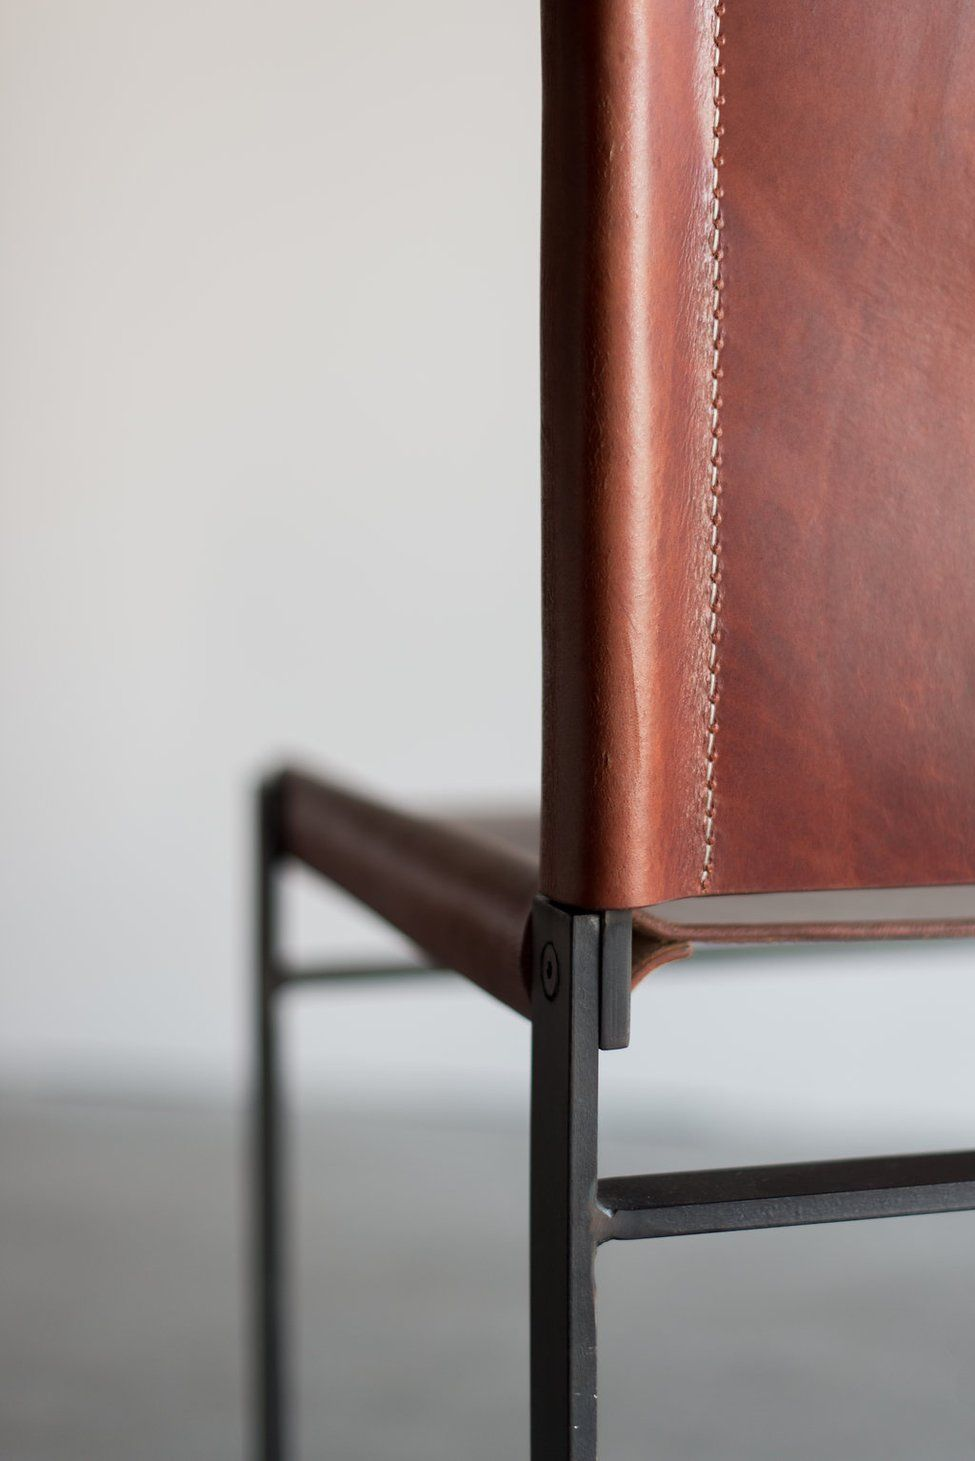 Latigo Dining Chair In 2020 Steel Dining Chair Chair Small Leather Chairs #small #leather #chairs #for #living #room